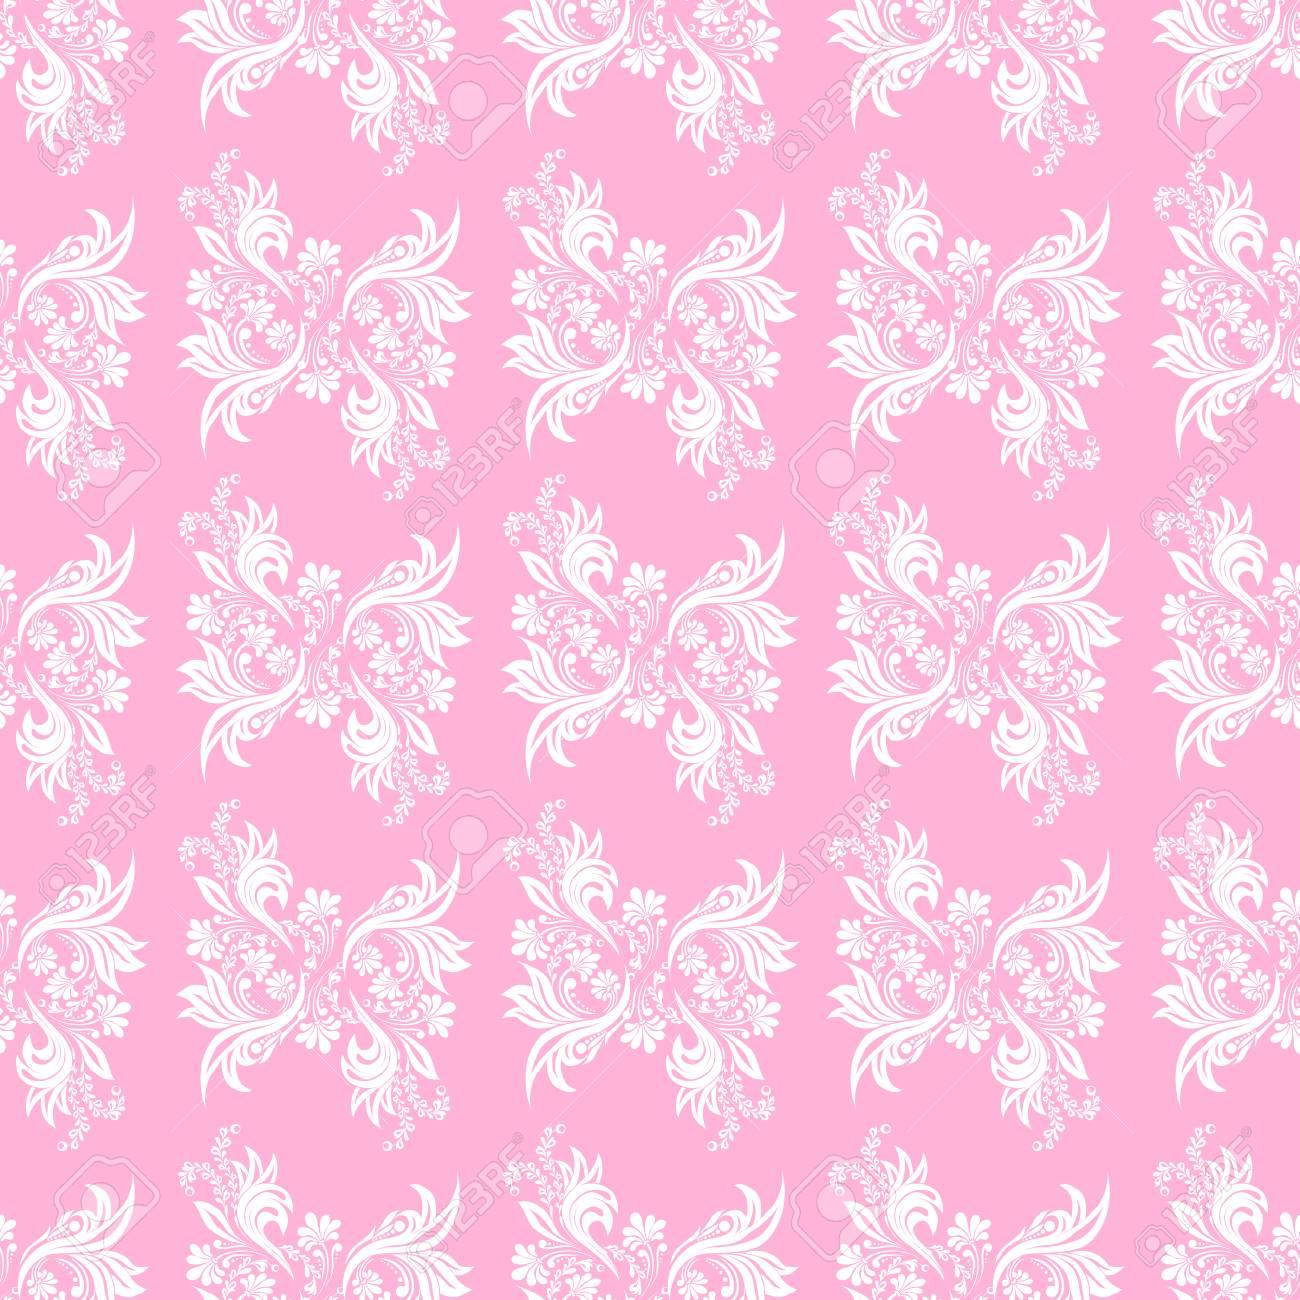 pink seamless pattern for wall wallpaper fabric textile design rh 123rf com